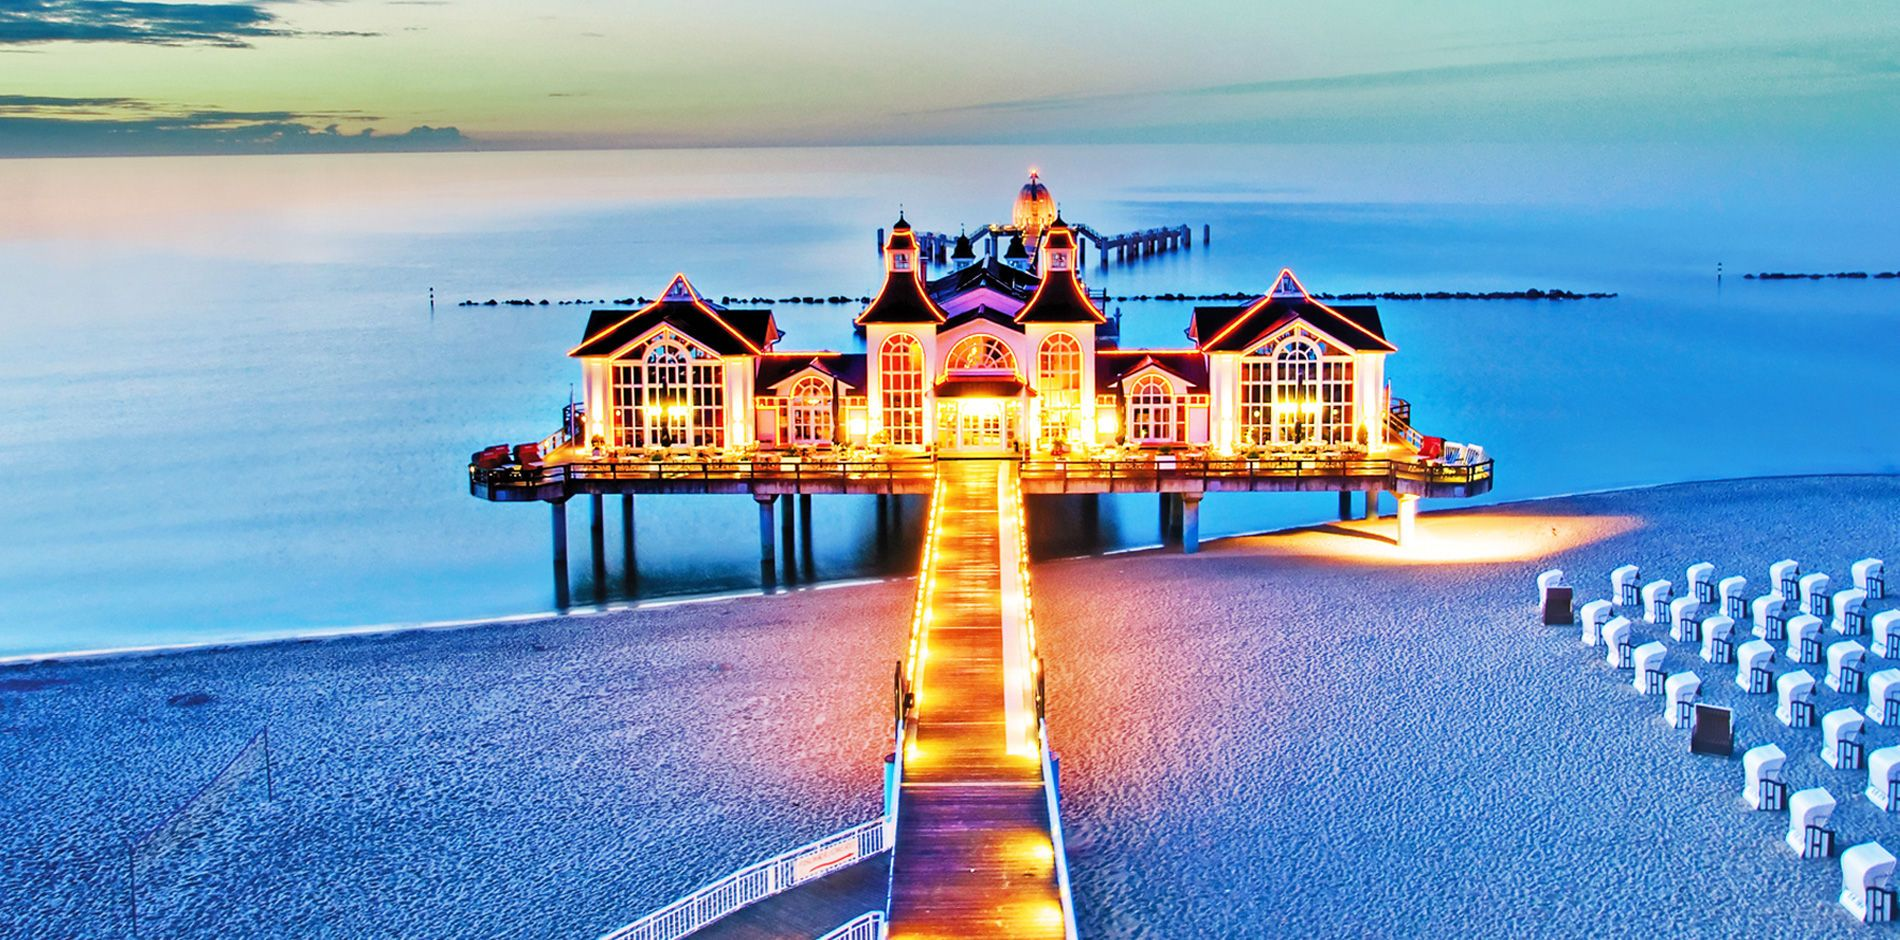 Hotels kurzurlaub ostsee vacation urlaub kurzurlaub for Urlaub ostsee gunstig